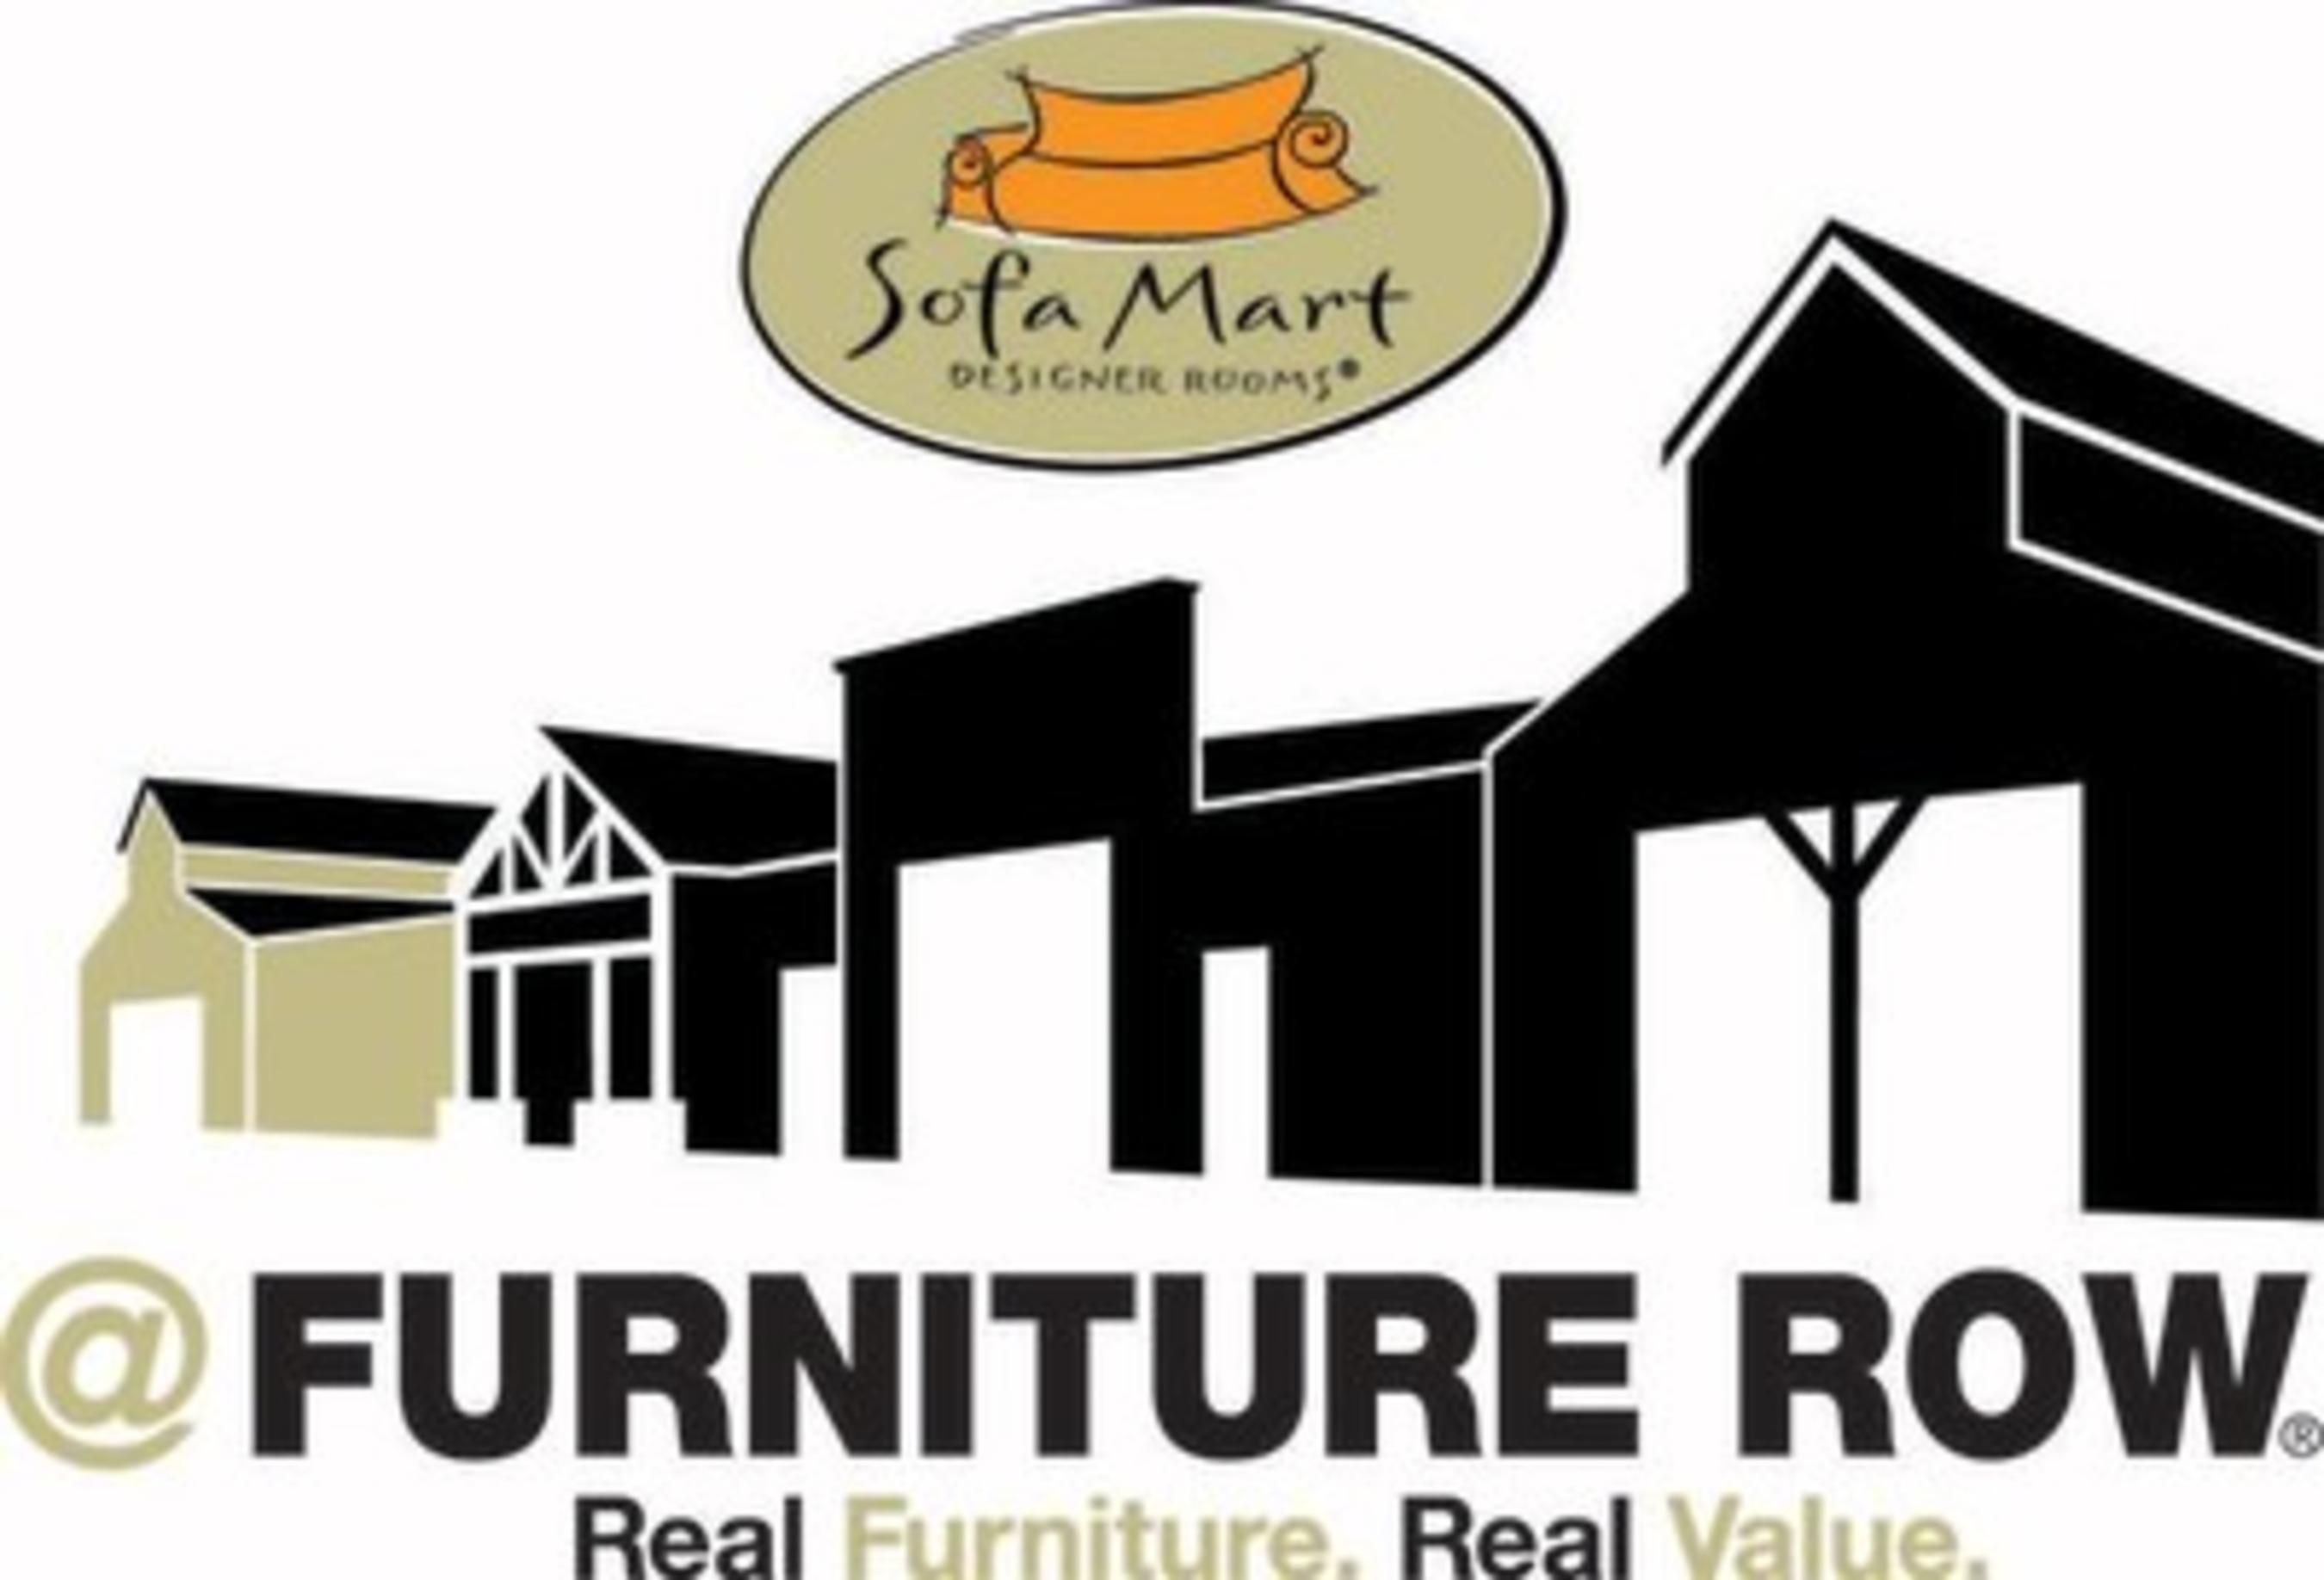 furniture row sofa mart financing minotti reveals new interior in huntsville al